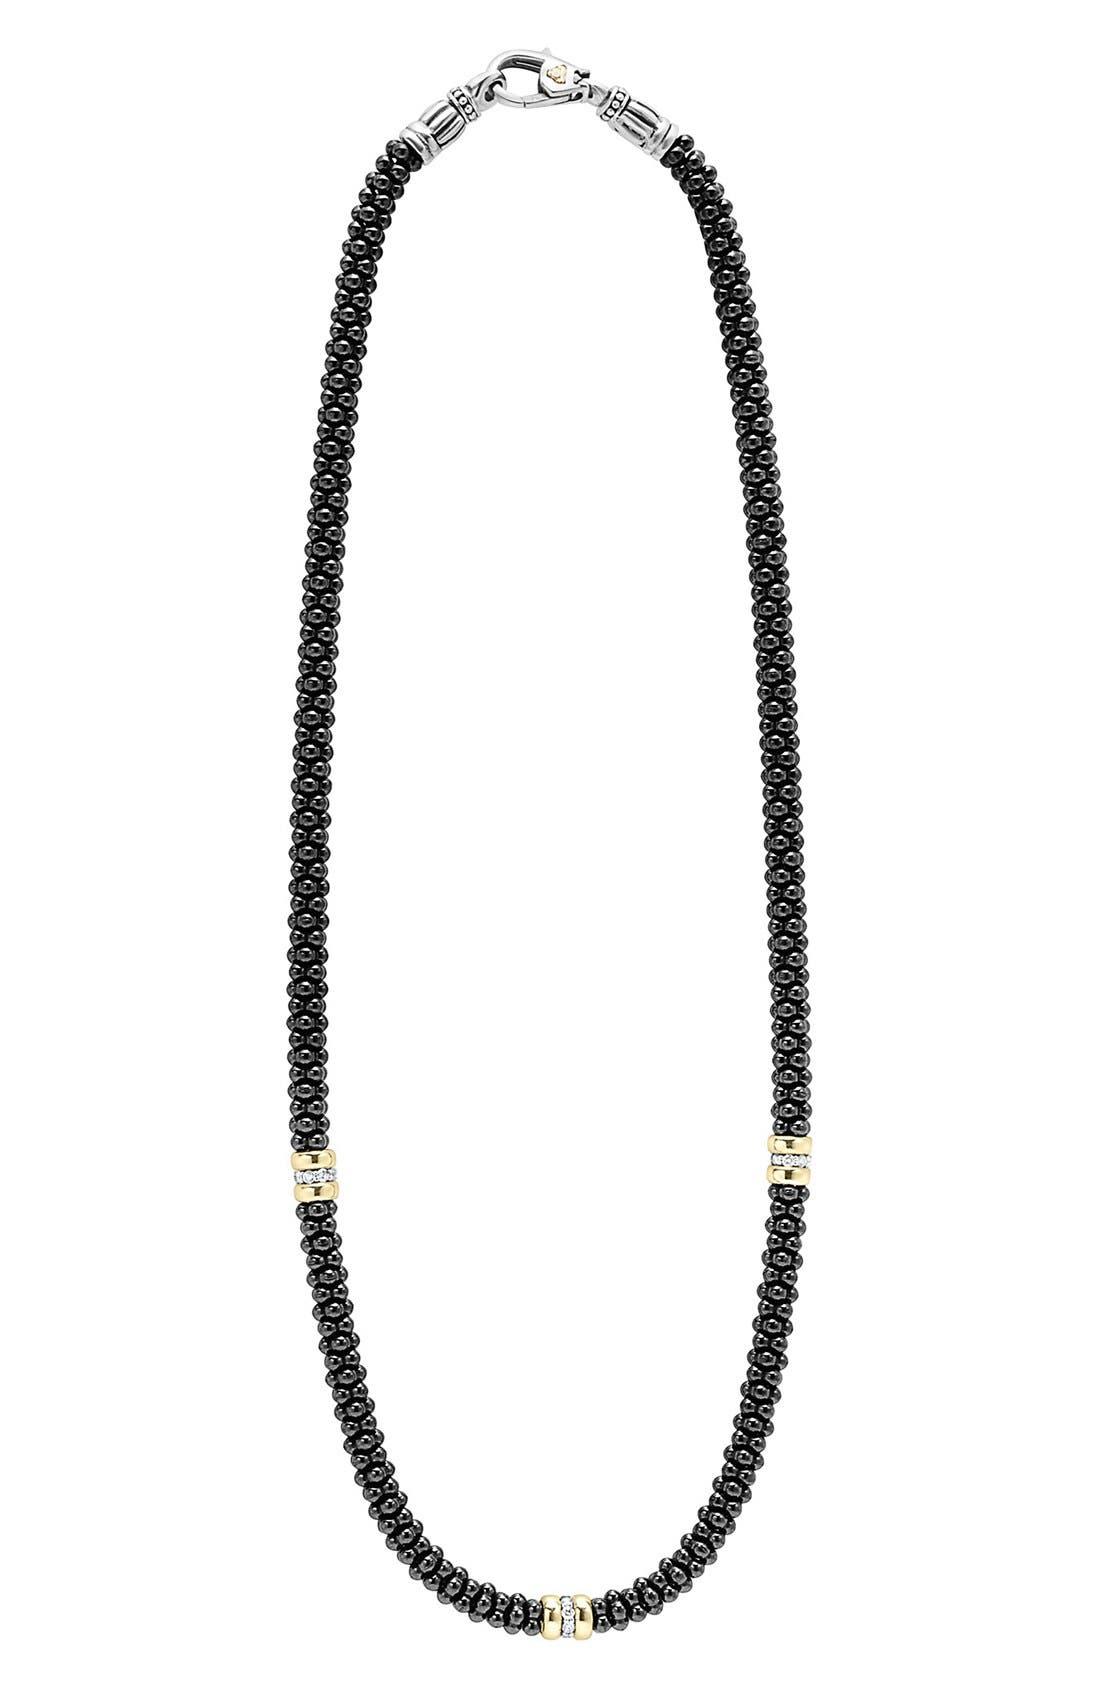 Alternate Image 1 Selected - LAGOS 'Black Caviar' Station Necklace